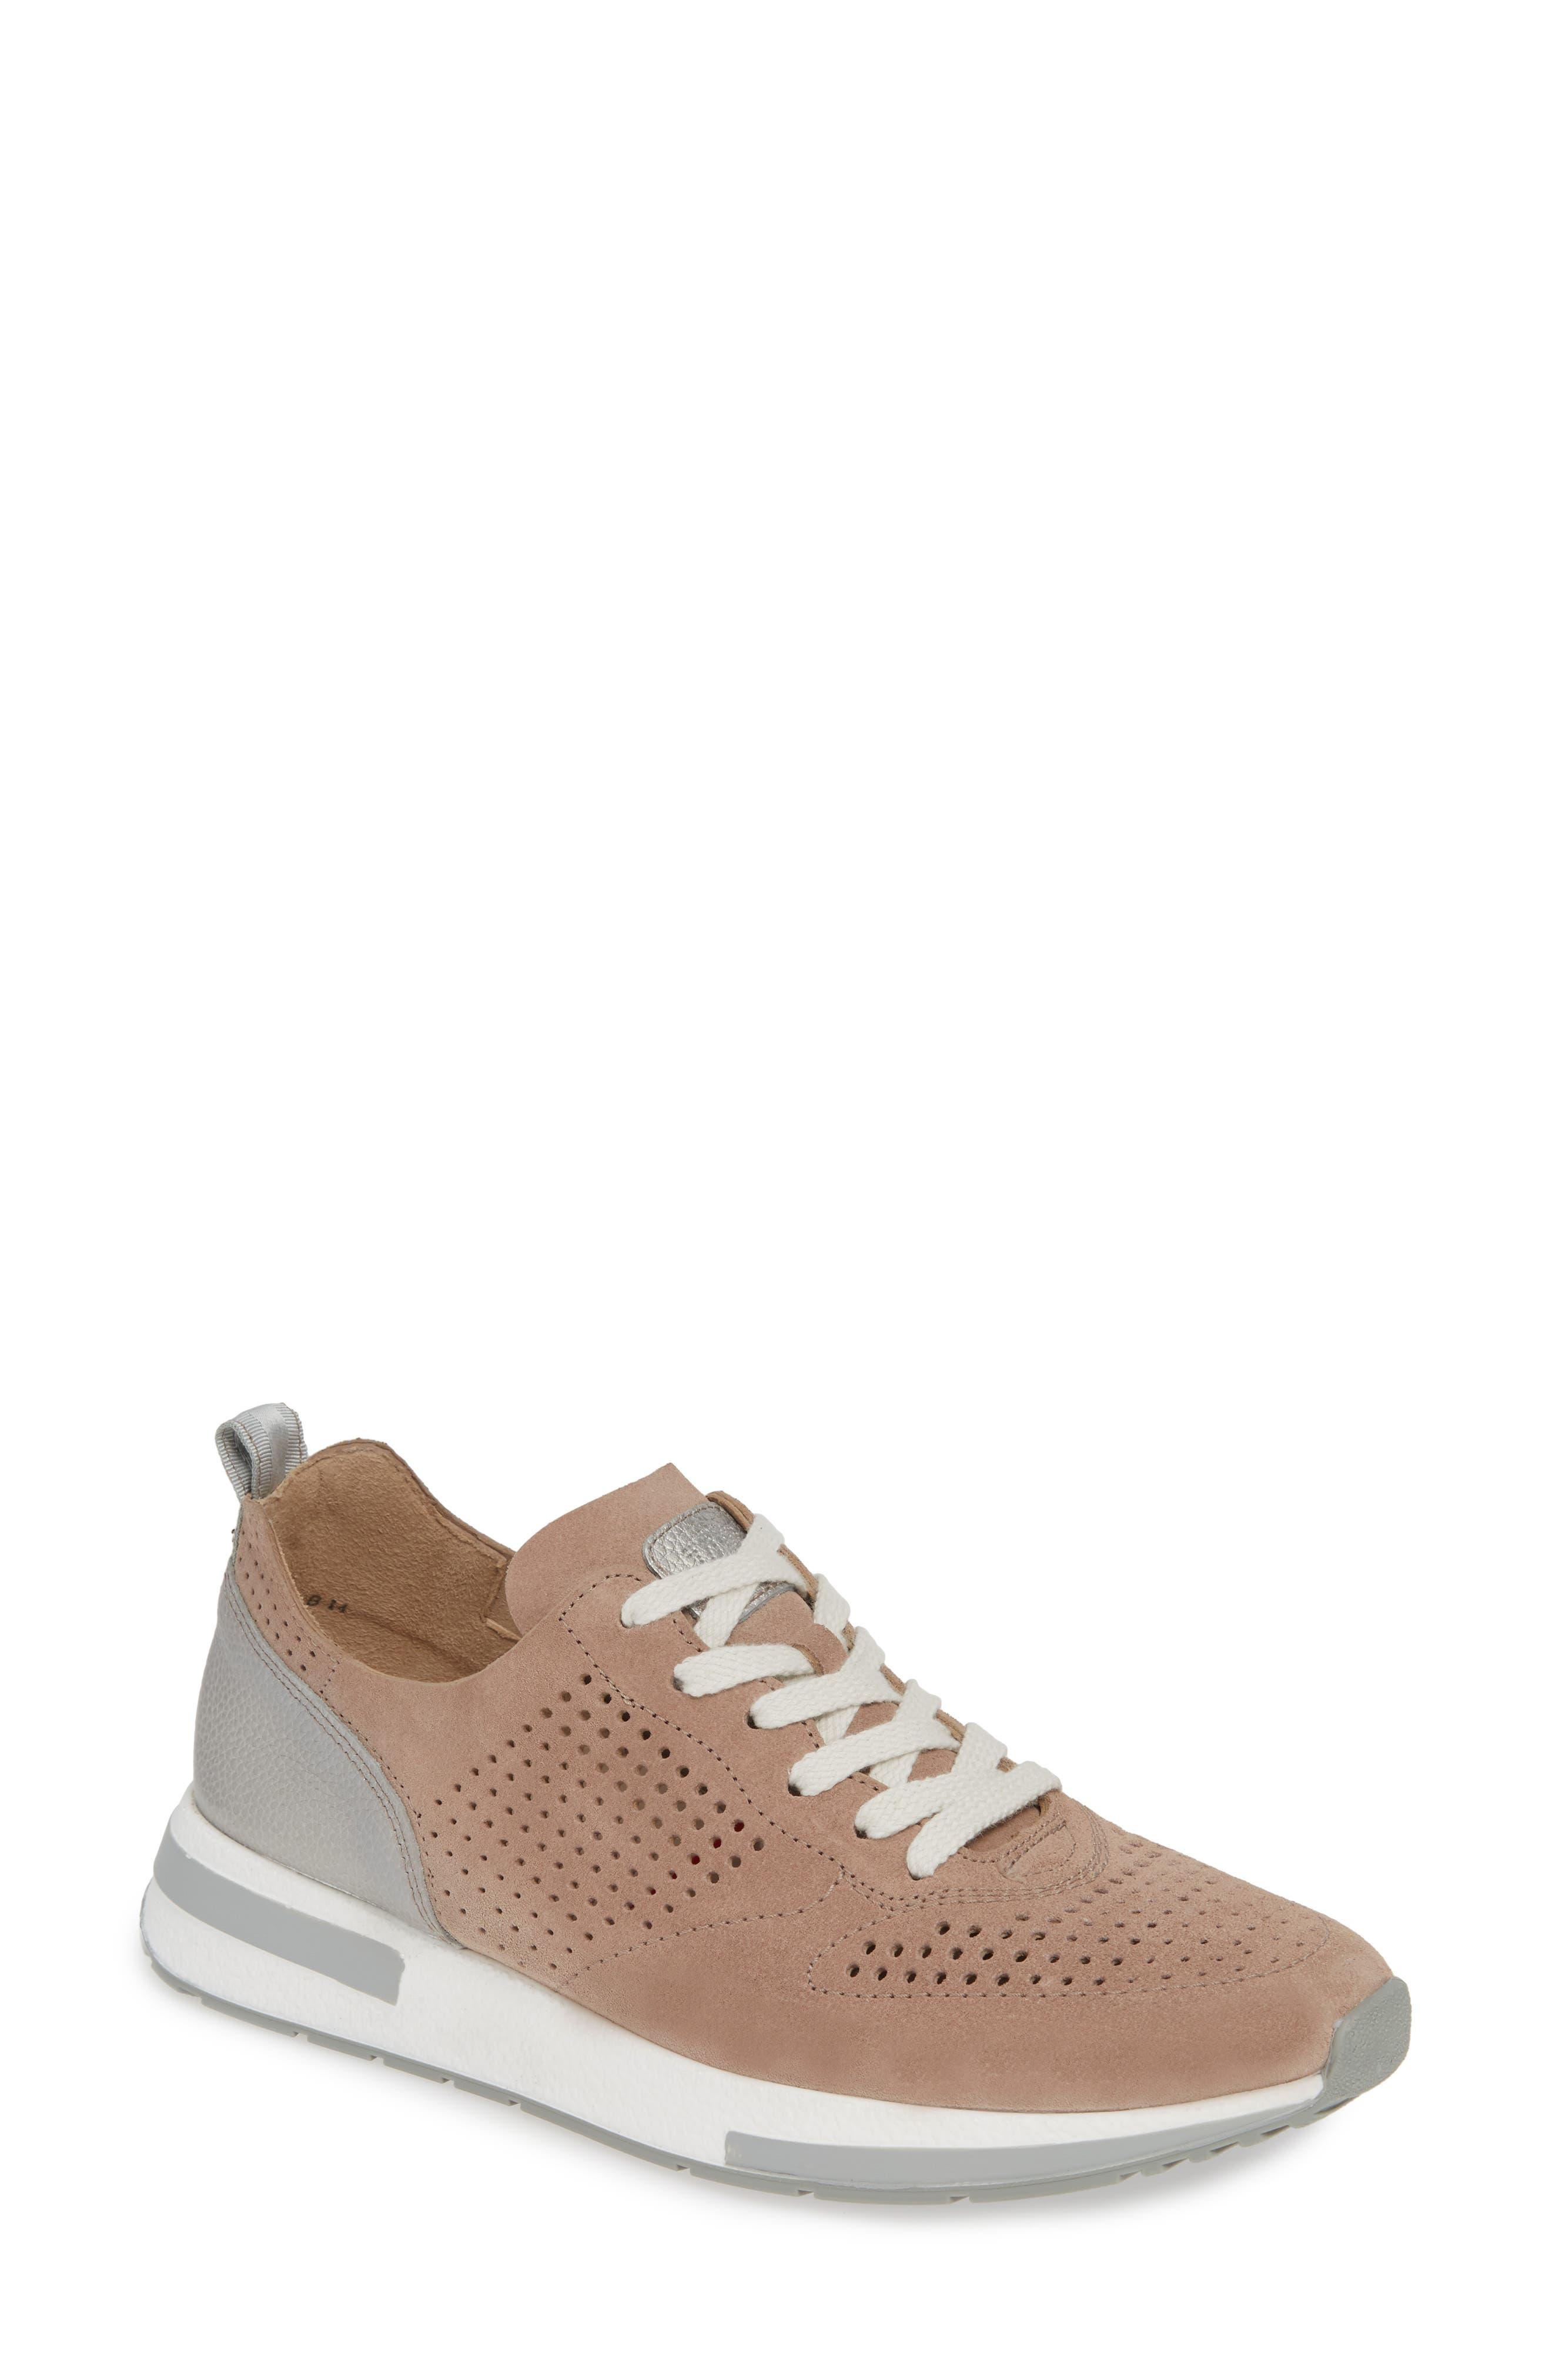 Paul Green Ariane SneakerUS /4UK - Beige